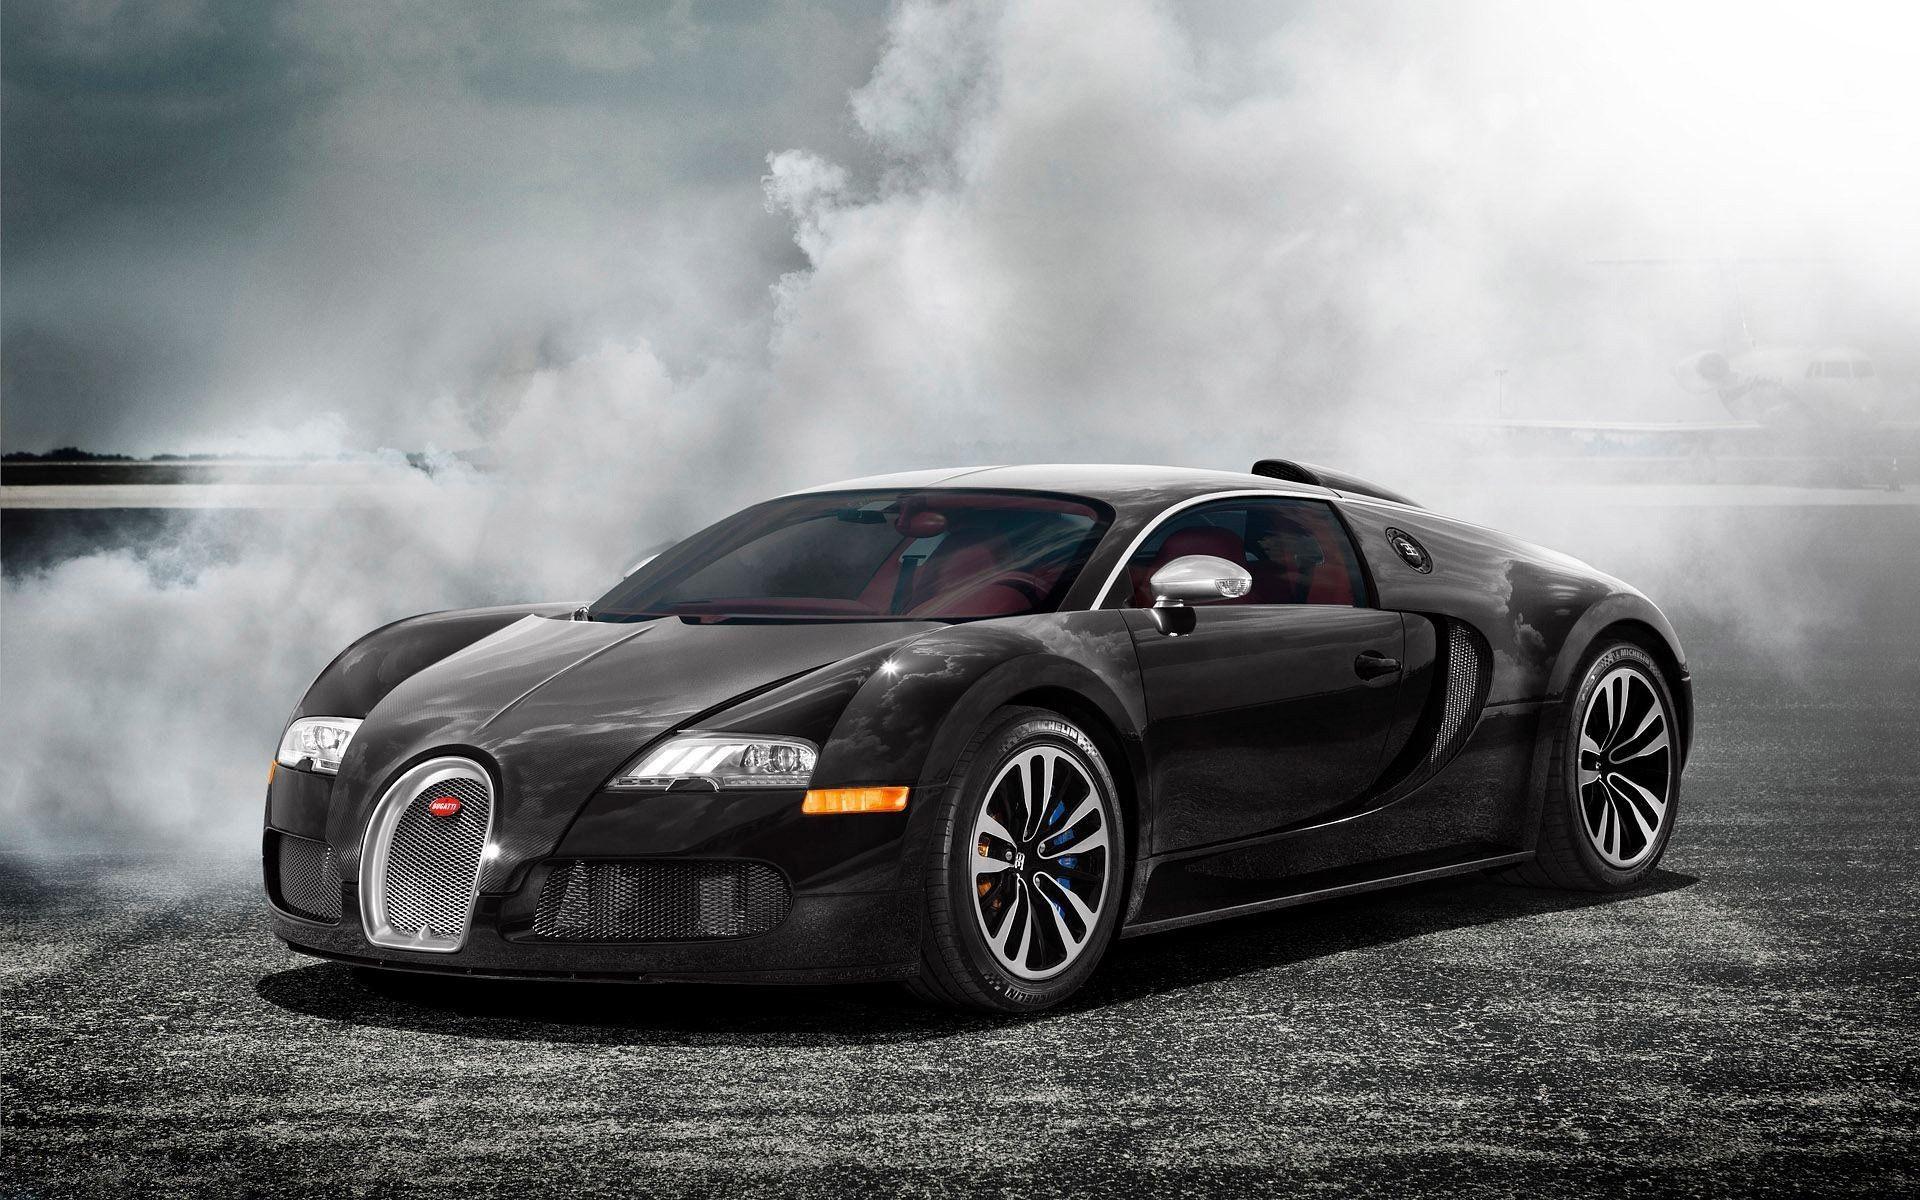 bd4f45adebe9e36b03c5527e091424cd Extraordinary Bugatti Veyron Price In Bangladesh Cars Trend